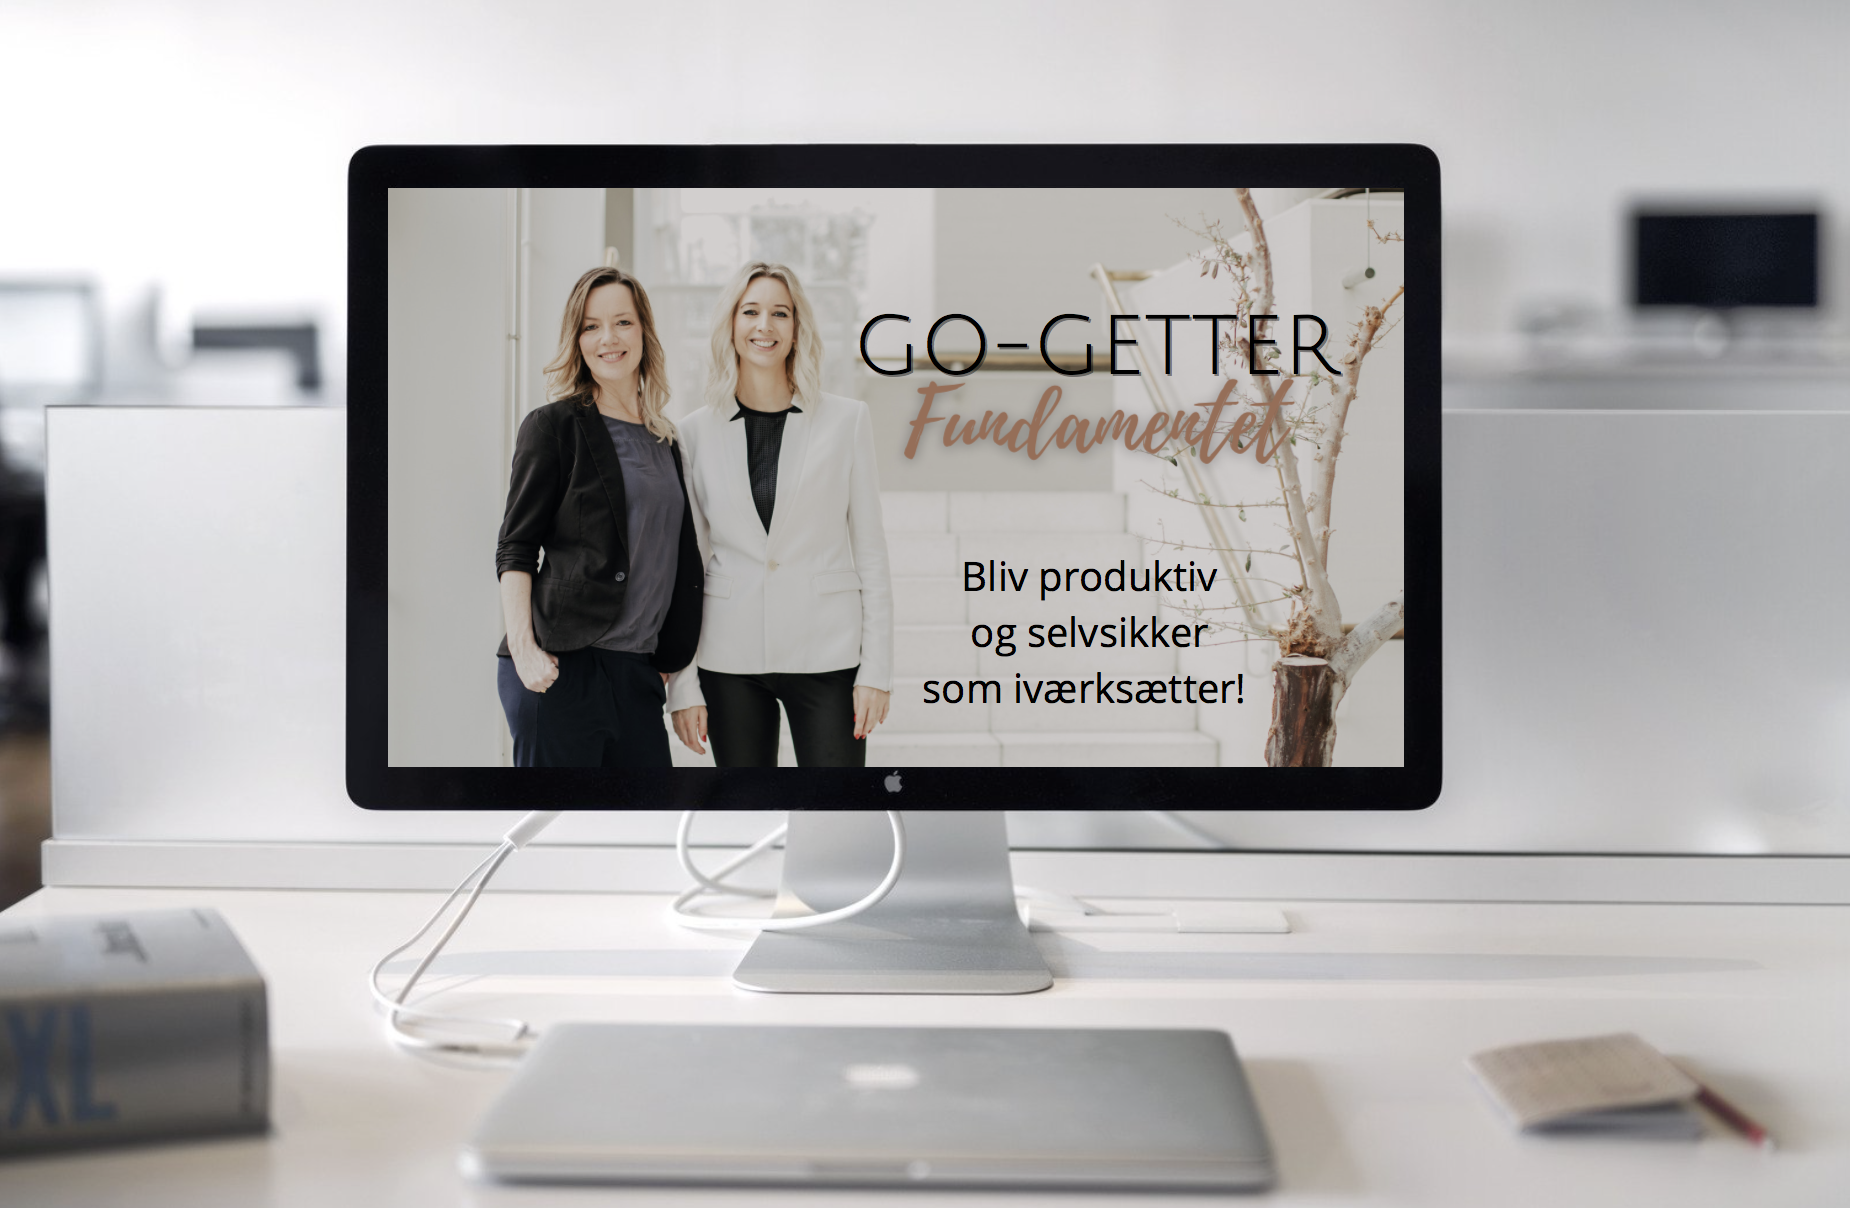 Go-Getter fundamentet